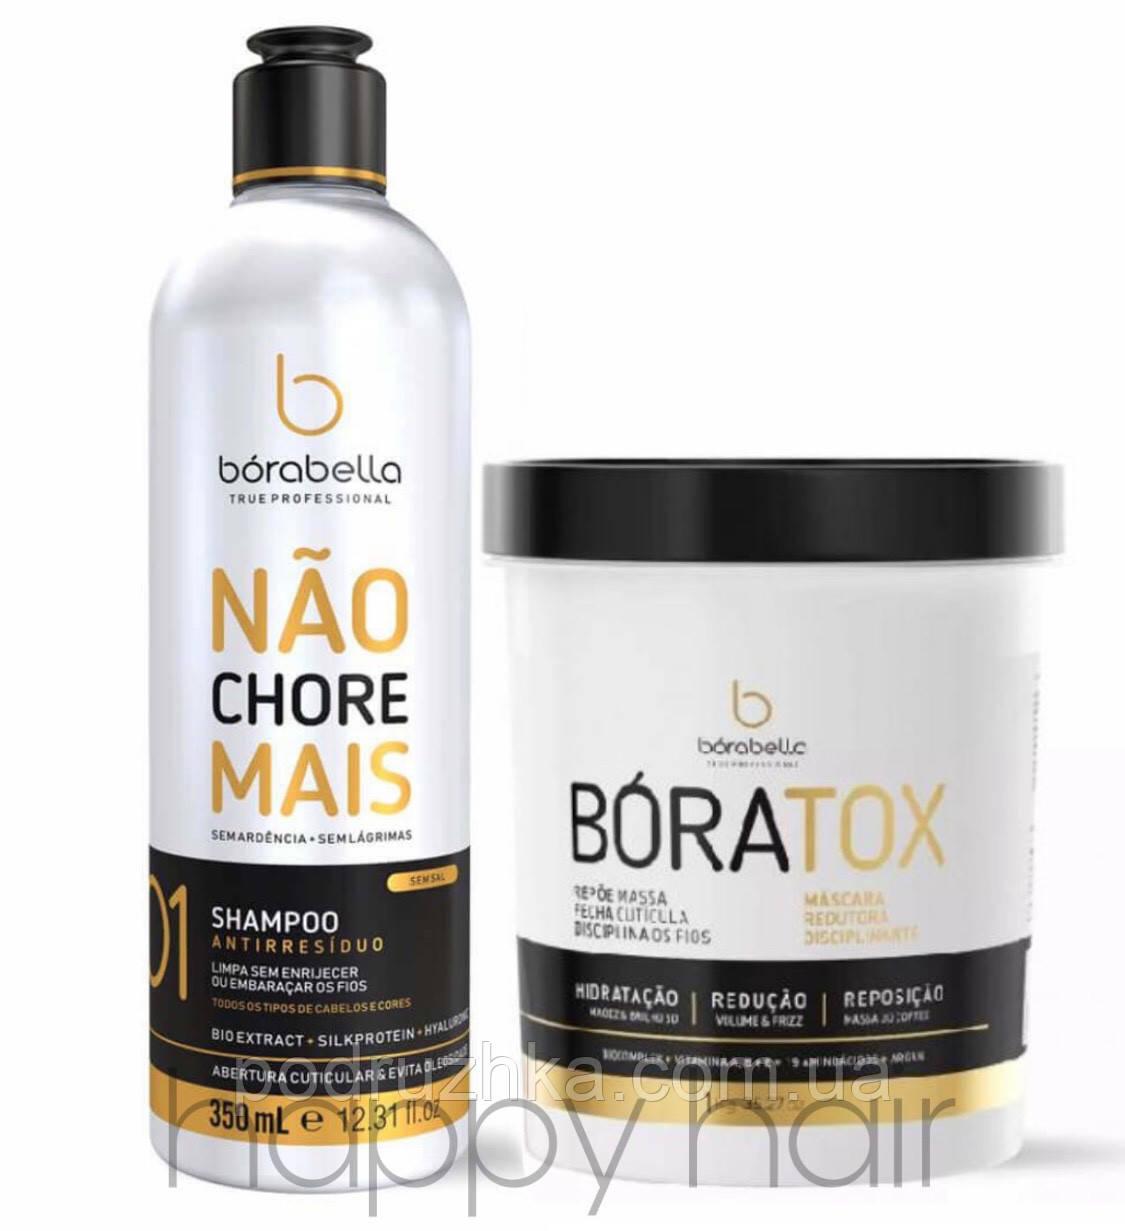 Borabella Organic Boratox Набор ботекс для волос 2х1000 г